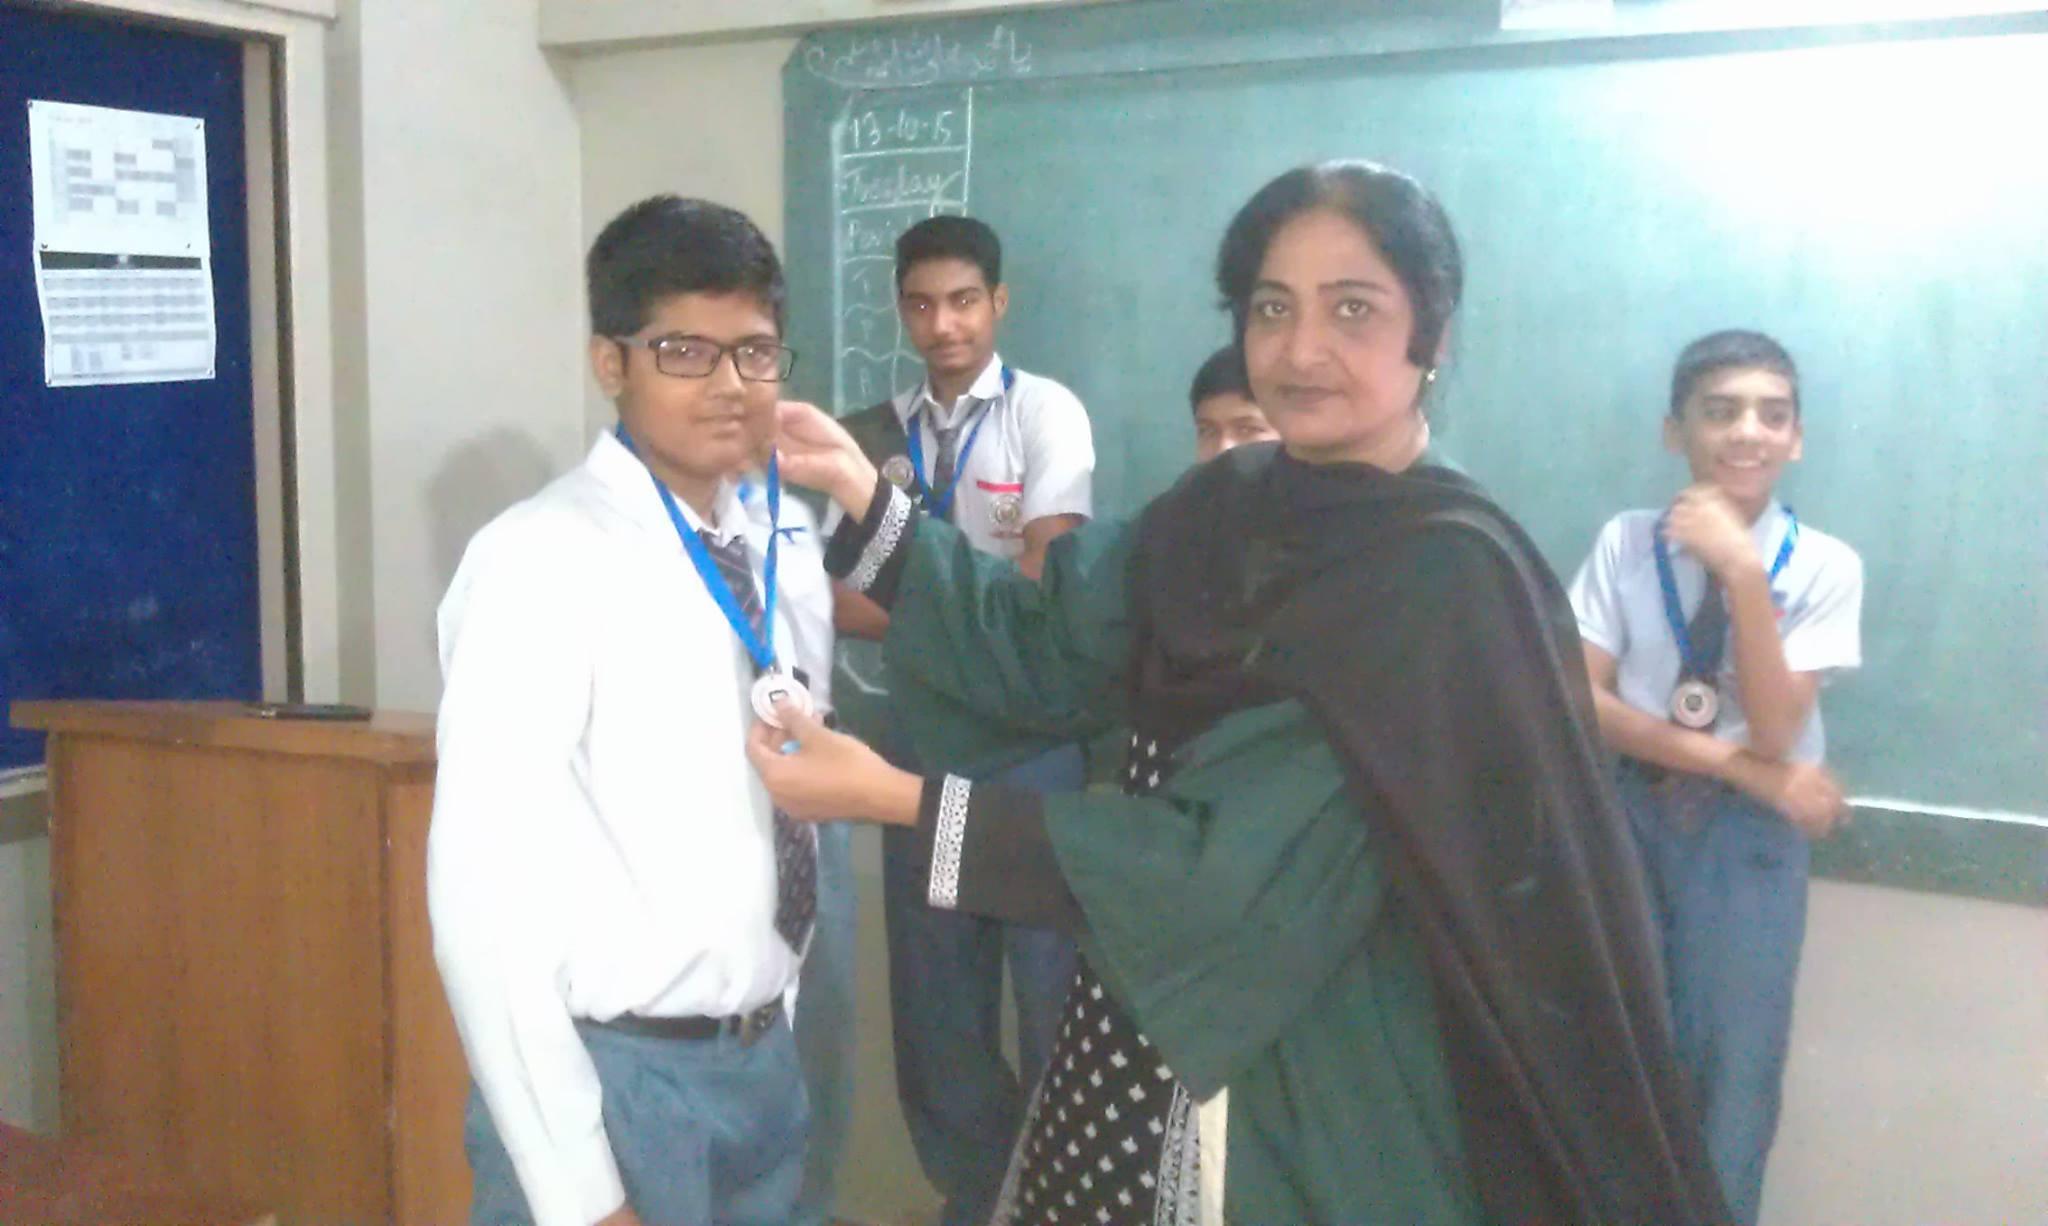 Students Awarded